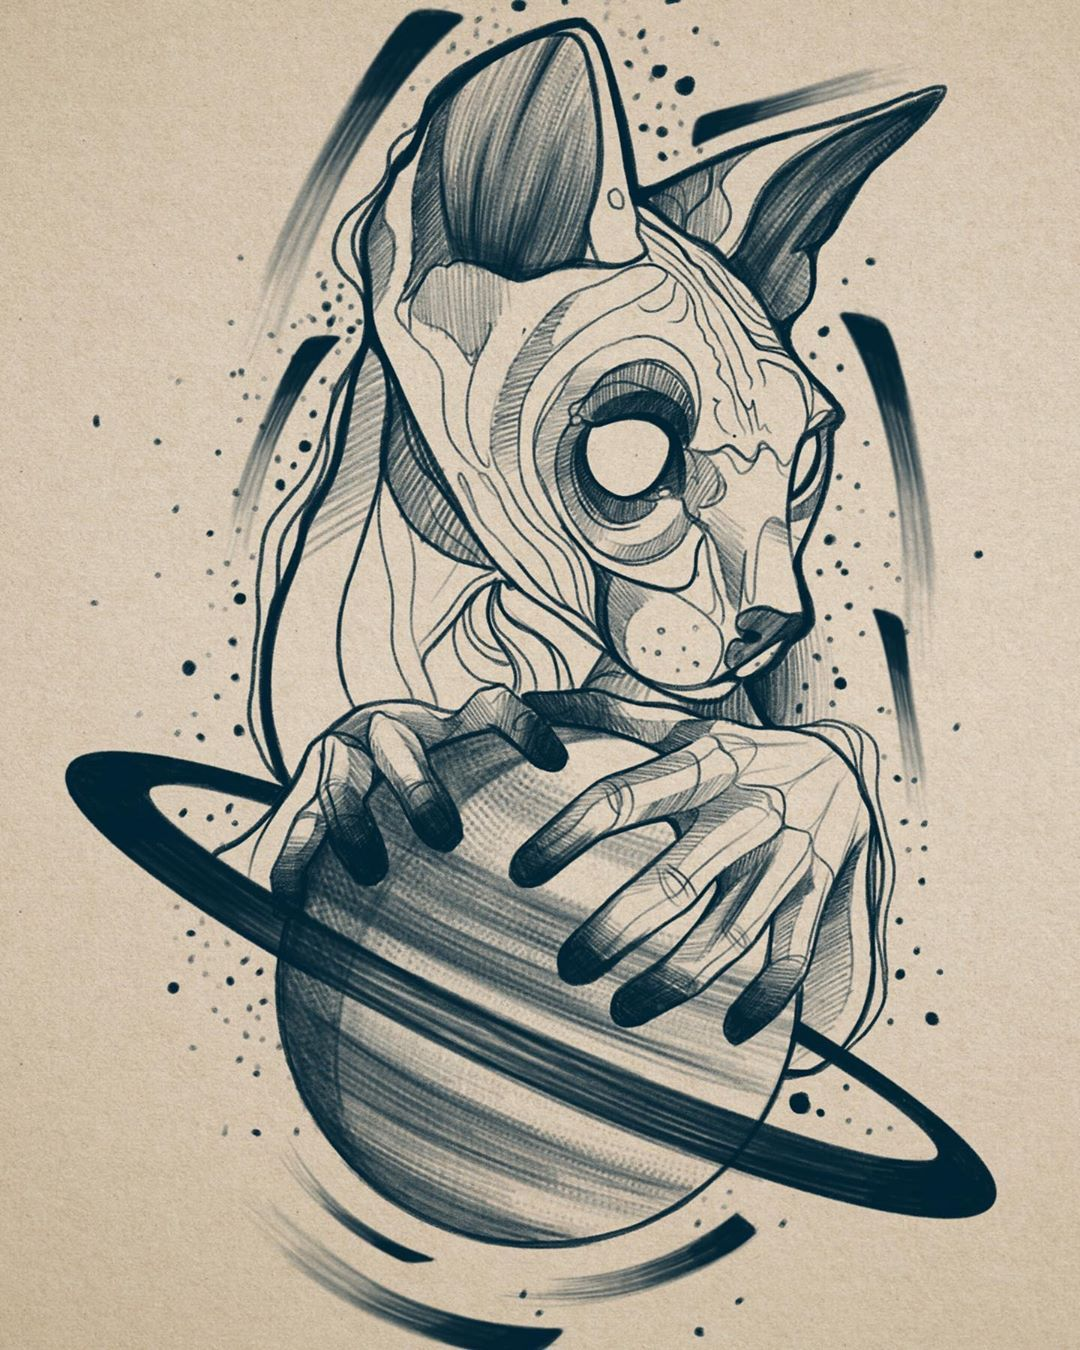 #tattoodesign #sfenks #procreate #drawings #sketch #illustration #sfenkstattoo #animaltattoo #tattoo #animalsketch #onurchavdar #blackwork #chaotic #galaxy #saturntattoo #saturn #space #gothictattoo